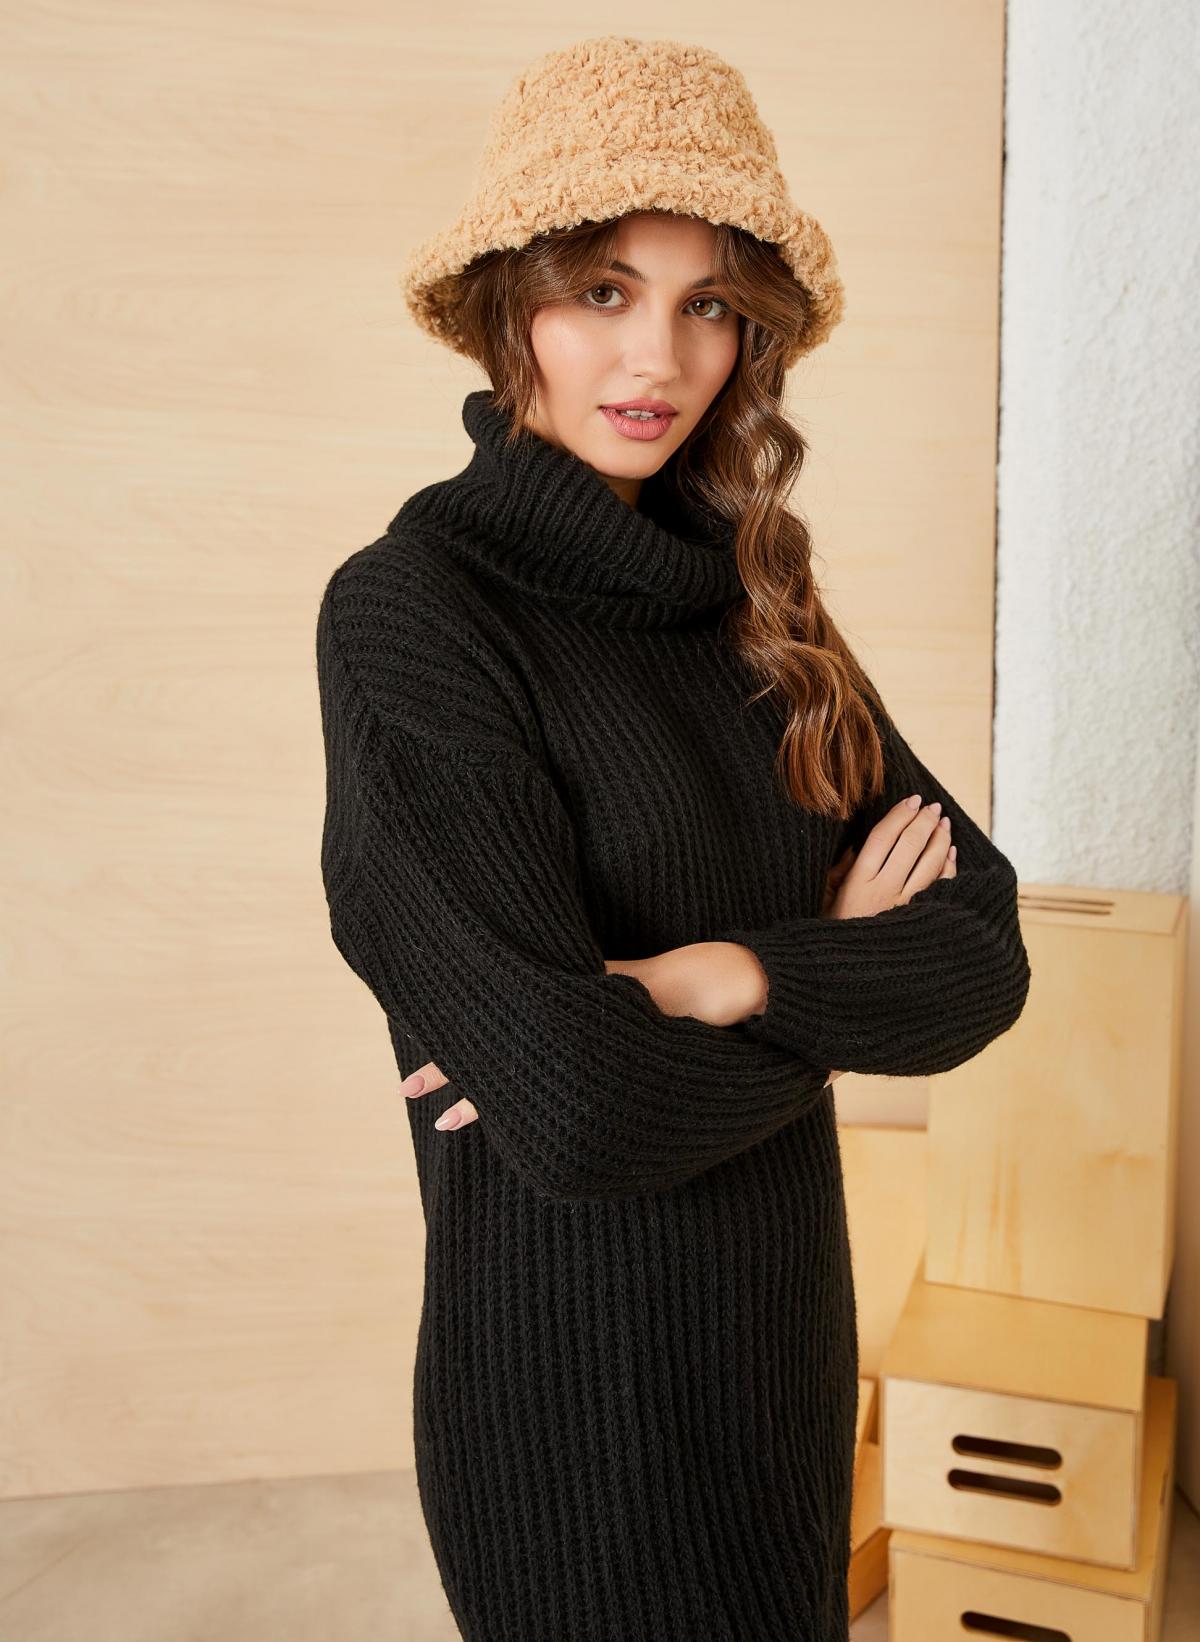 Bucket καπέλο από οικολογικό sheepskin - Κάμελ